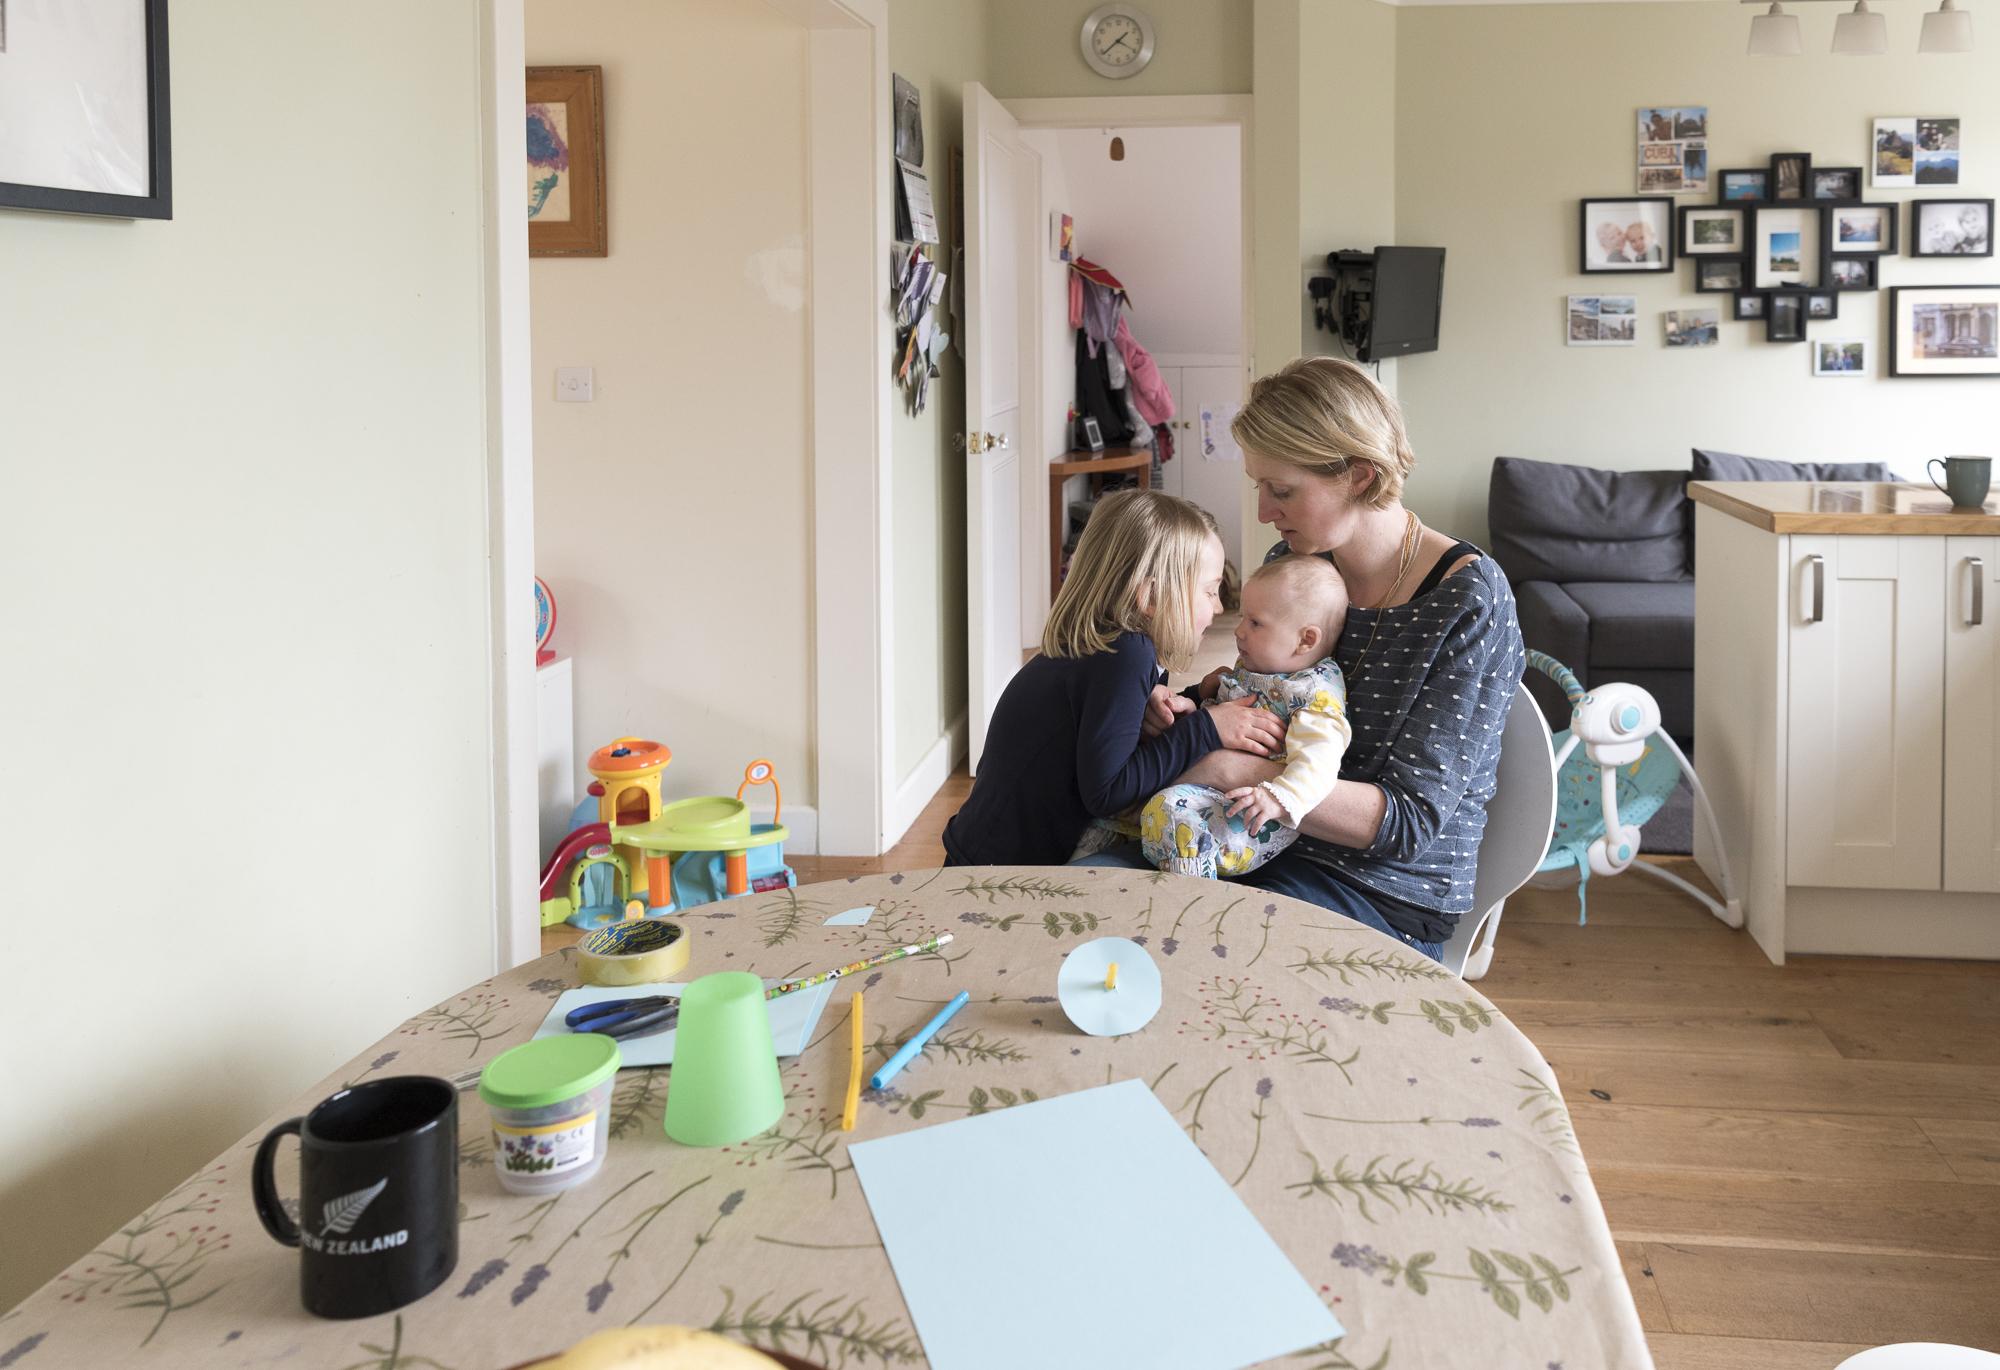 sally-hornung-photography-family-dining-room.jpg